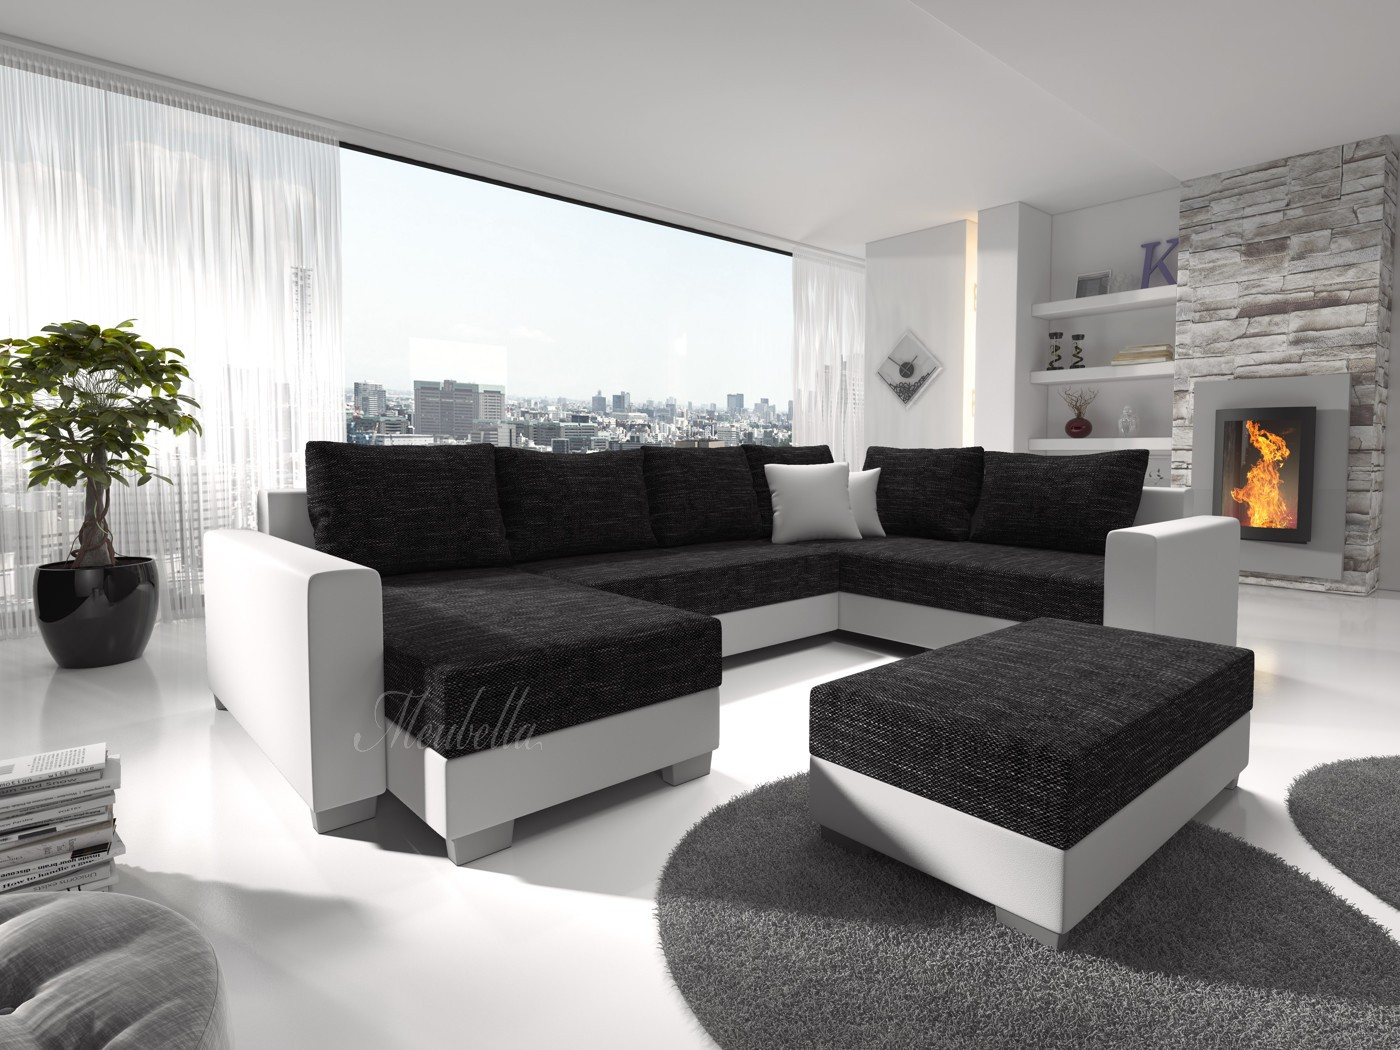 Zwart wit hoekbank studio kop en schotel - Moderne zwart witte lounge ...